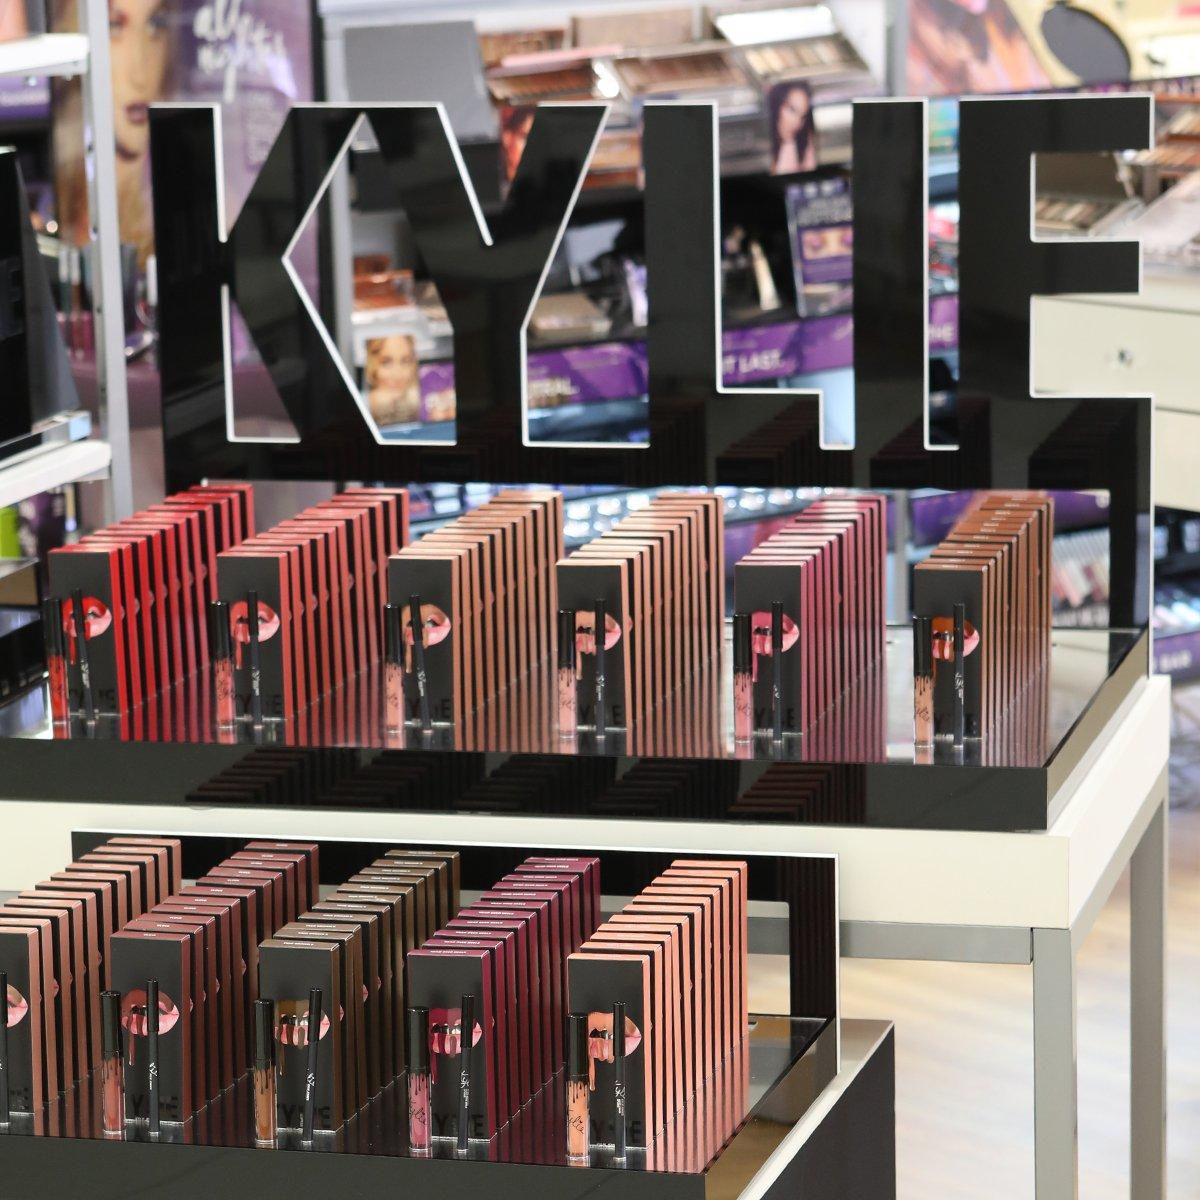 ???? @kyliecosmetics is dropping in EVERY Ulta Beauty store on 11/17 @ultabeauty https://t.co/cKV48vFB5D